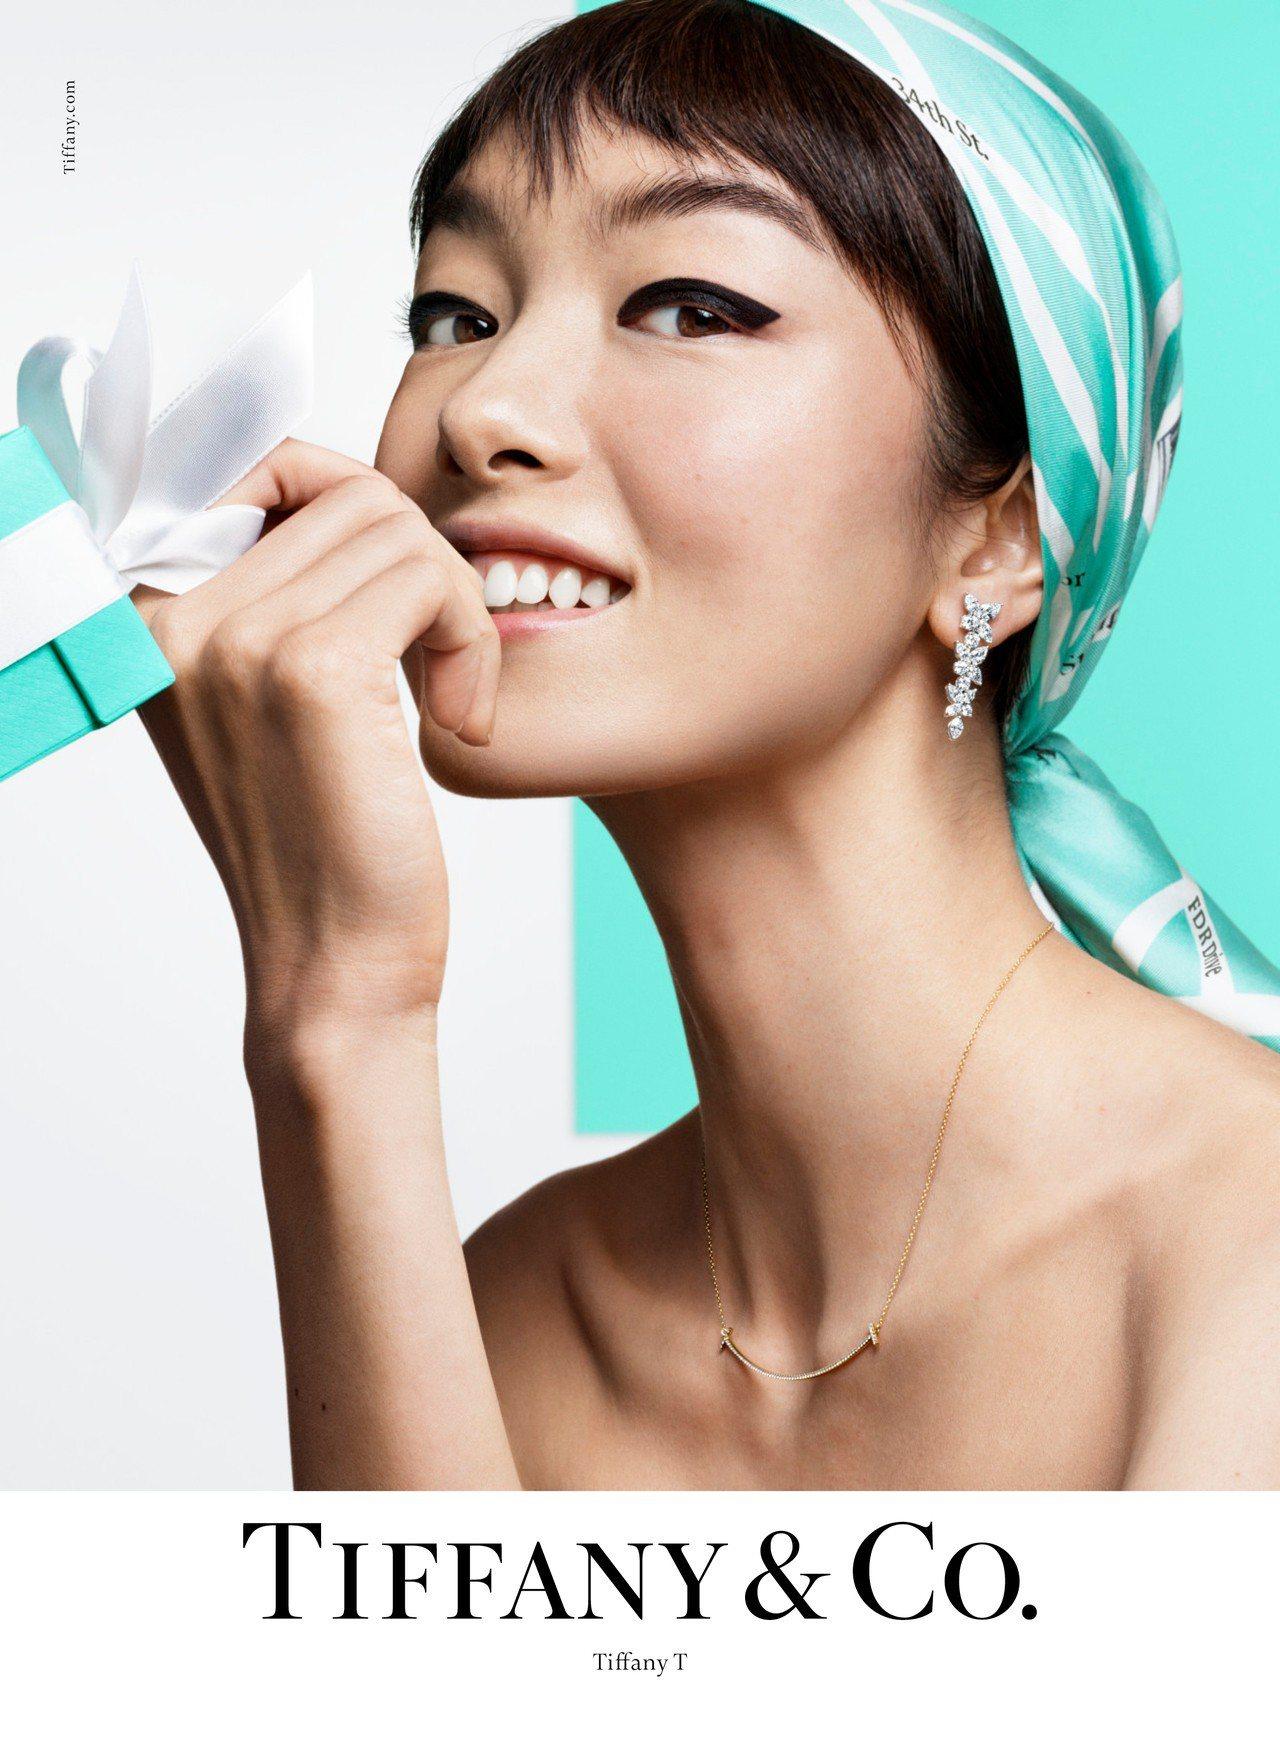 超模孫菲菲演繹Tiffany & Co.春季形象大片。圖/Tiffany & C...